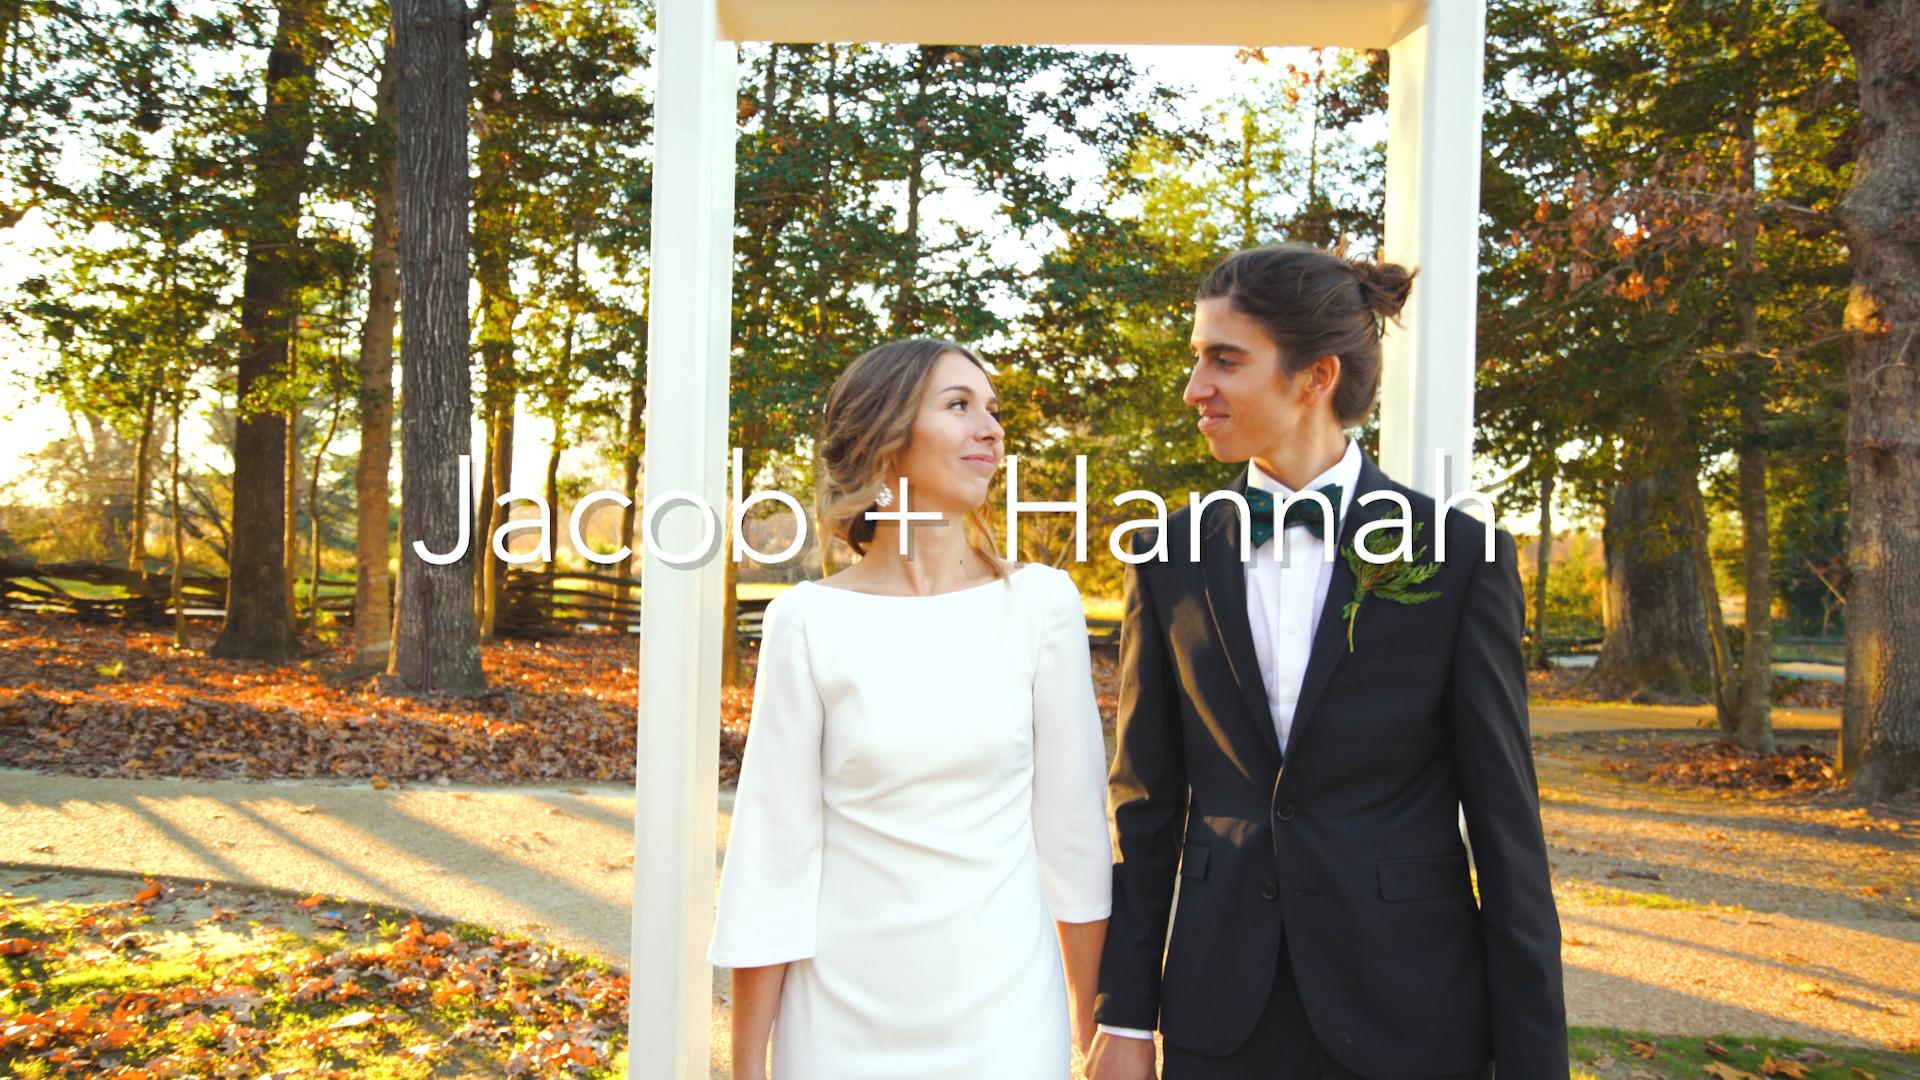 Hannah + Jacob | ,  |